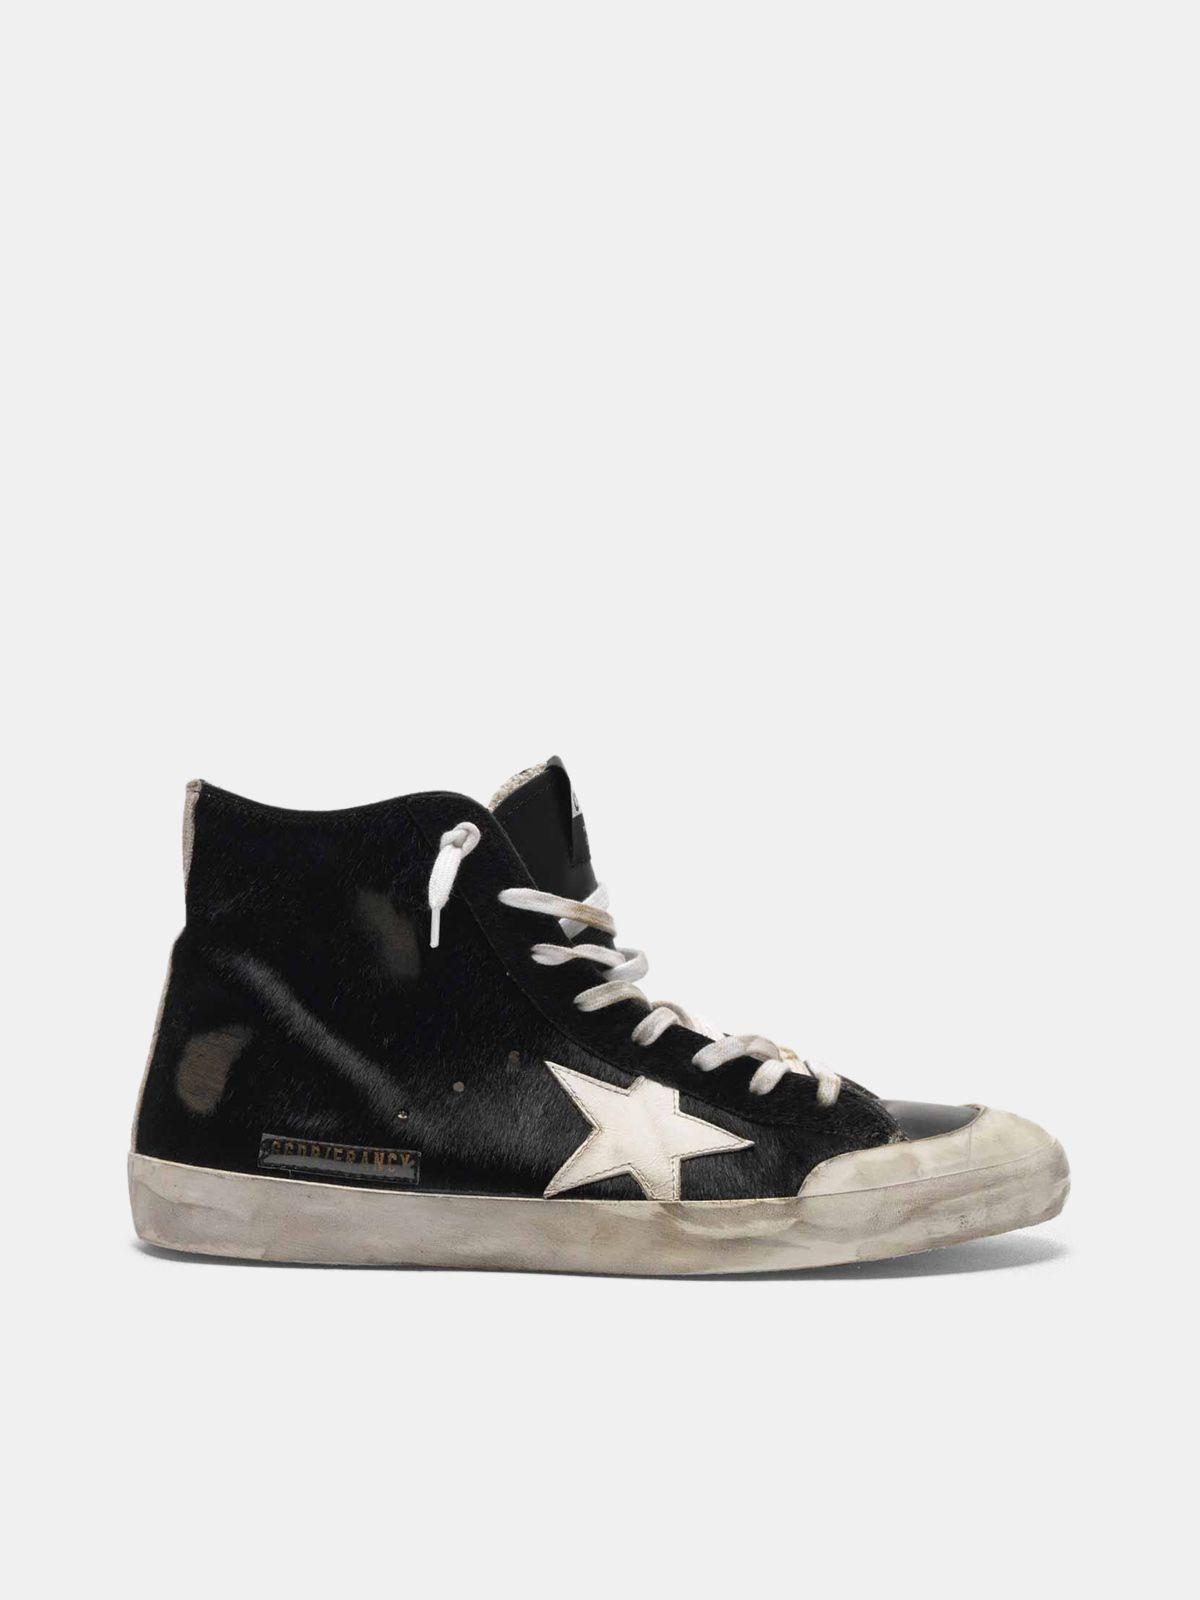 Golden Goose - Sneakers Francy in cavallino con stella a contrasto in